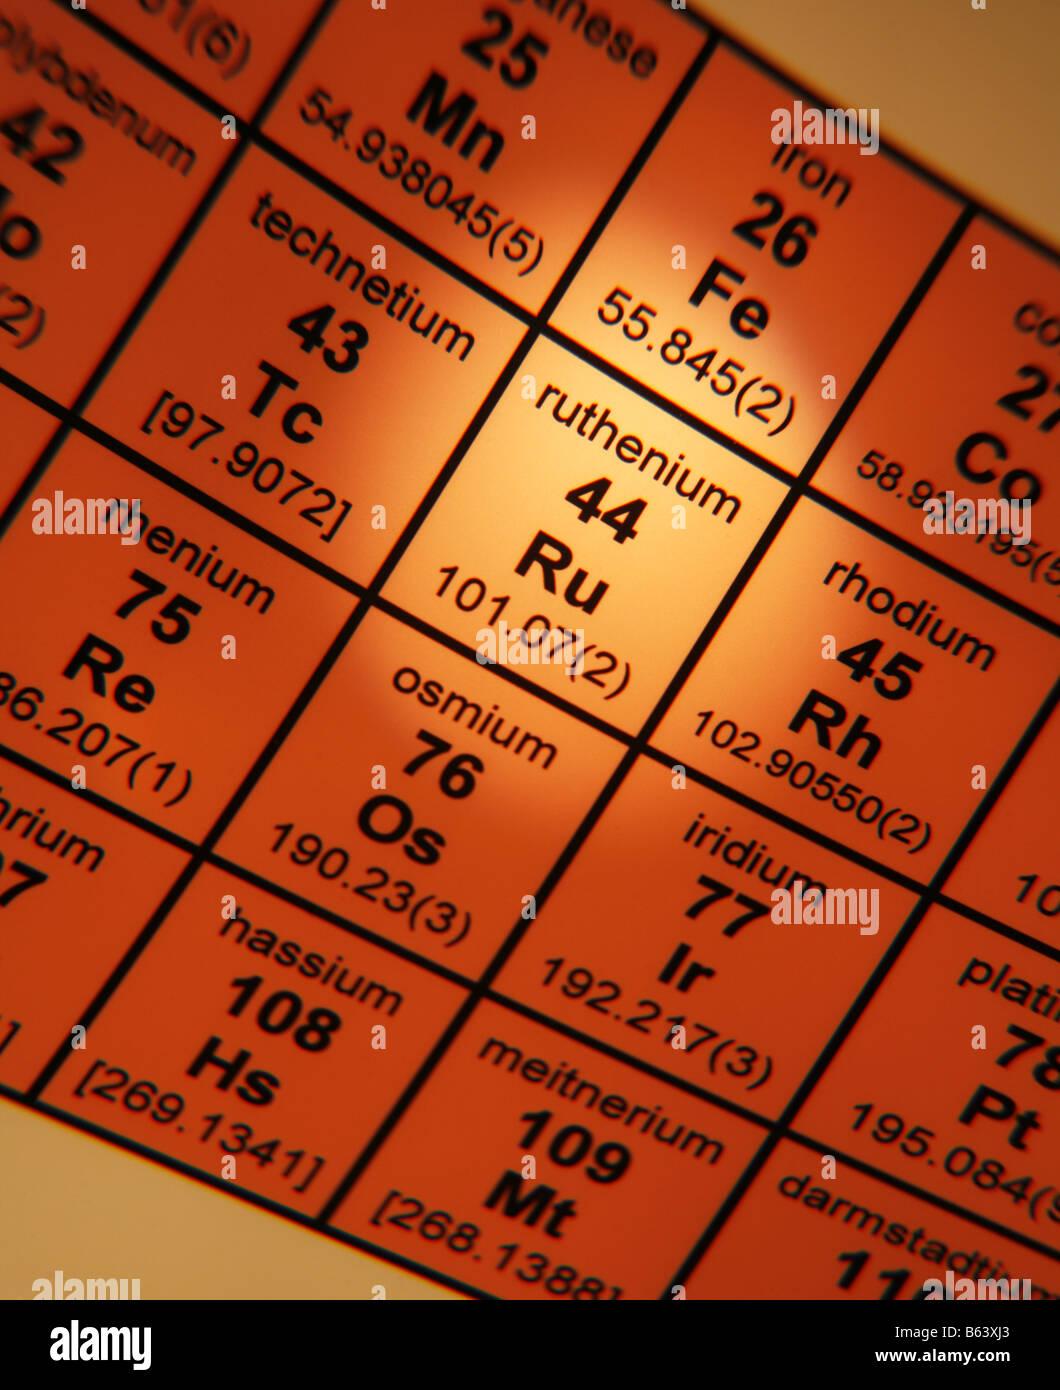 Periodic Table of Elements Ruthenium - Stock Image